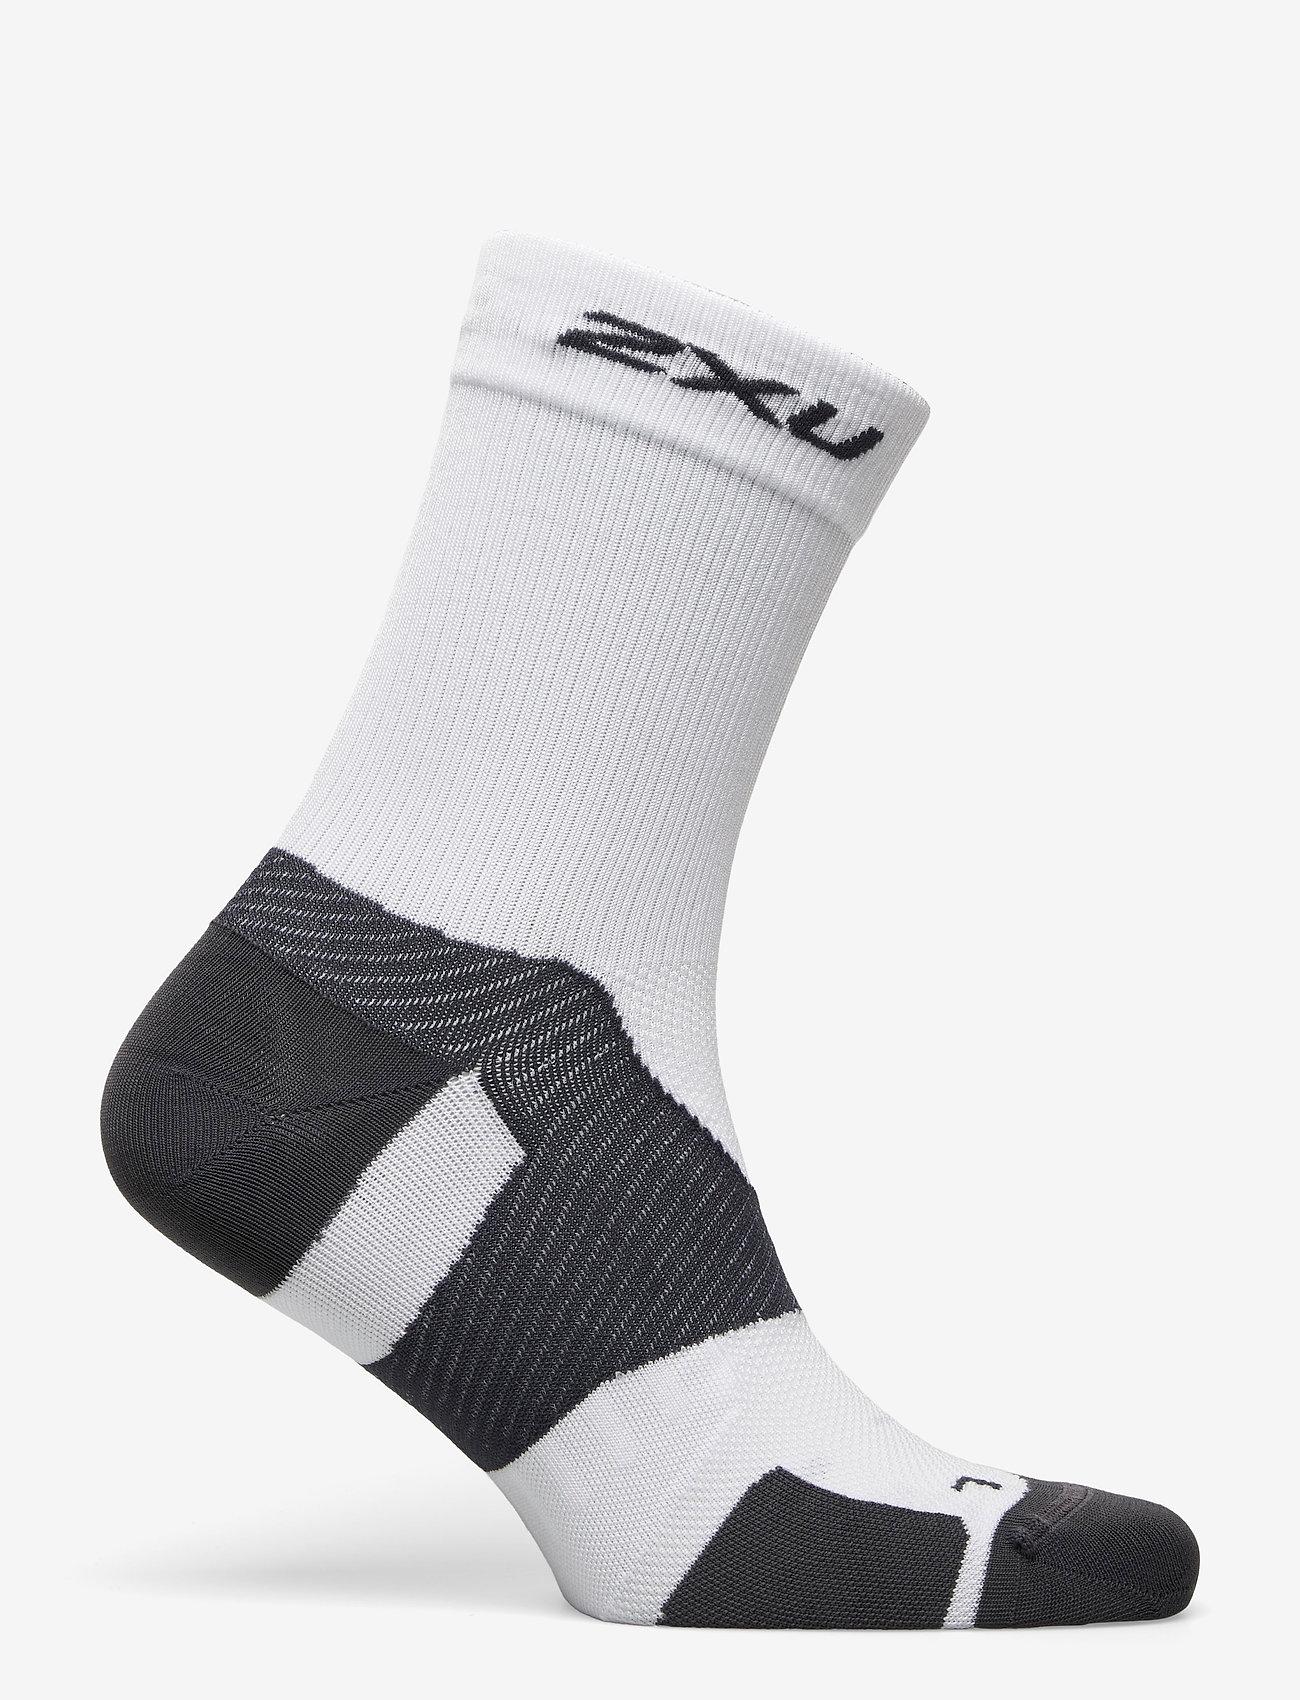 2XU - VECTR ULTRALIGHT CREW SOCKS - kousen - white/grey - 1